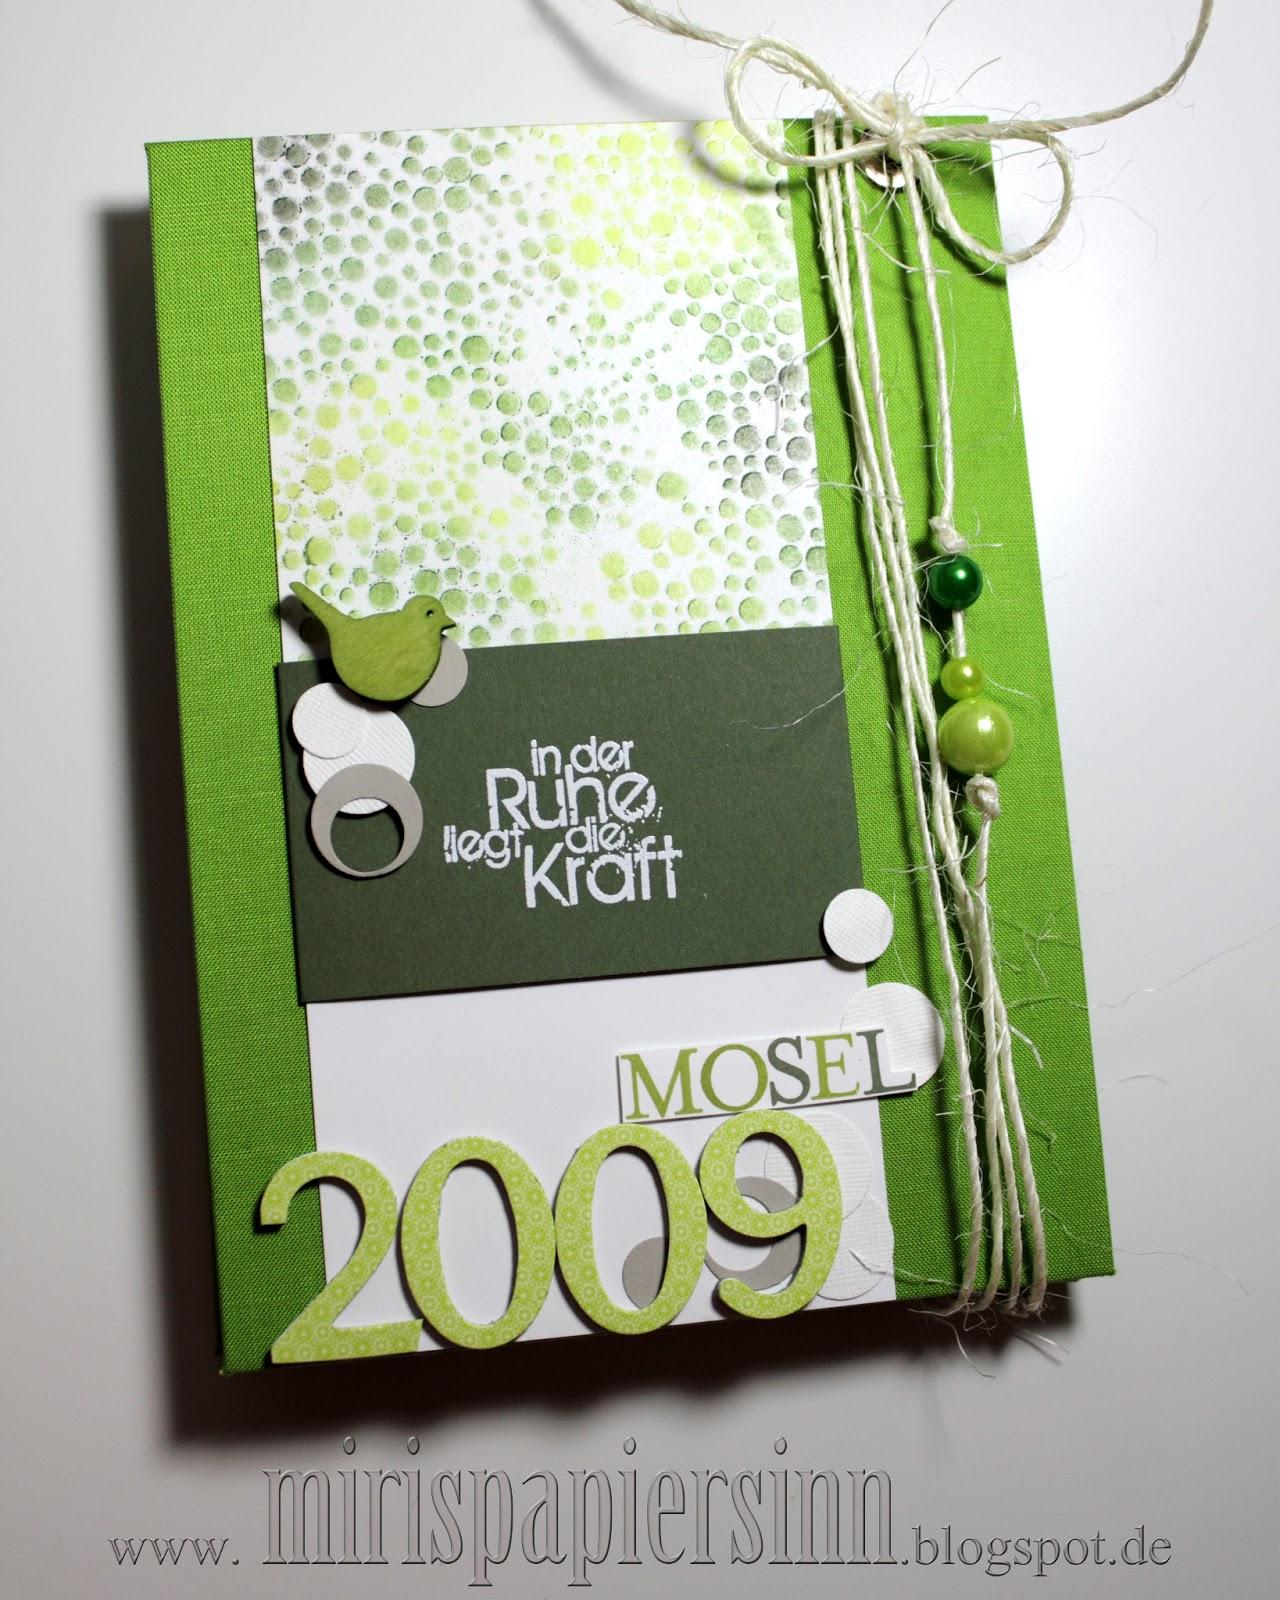 Miris papiersinn juli 2013 - Fotoalbum dekorieren ...